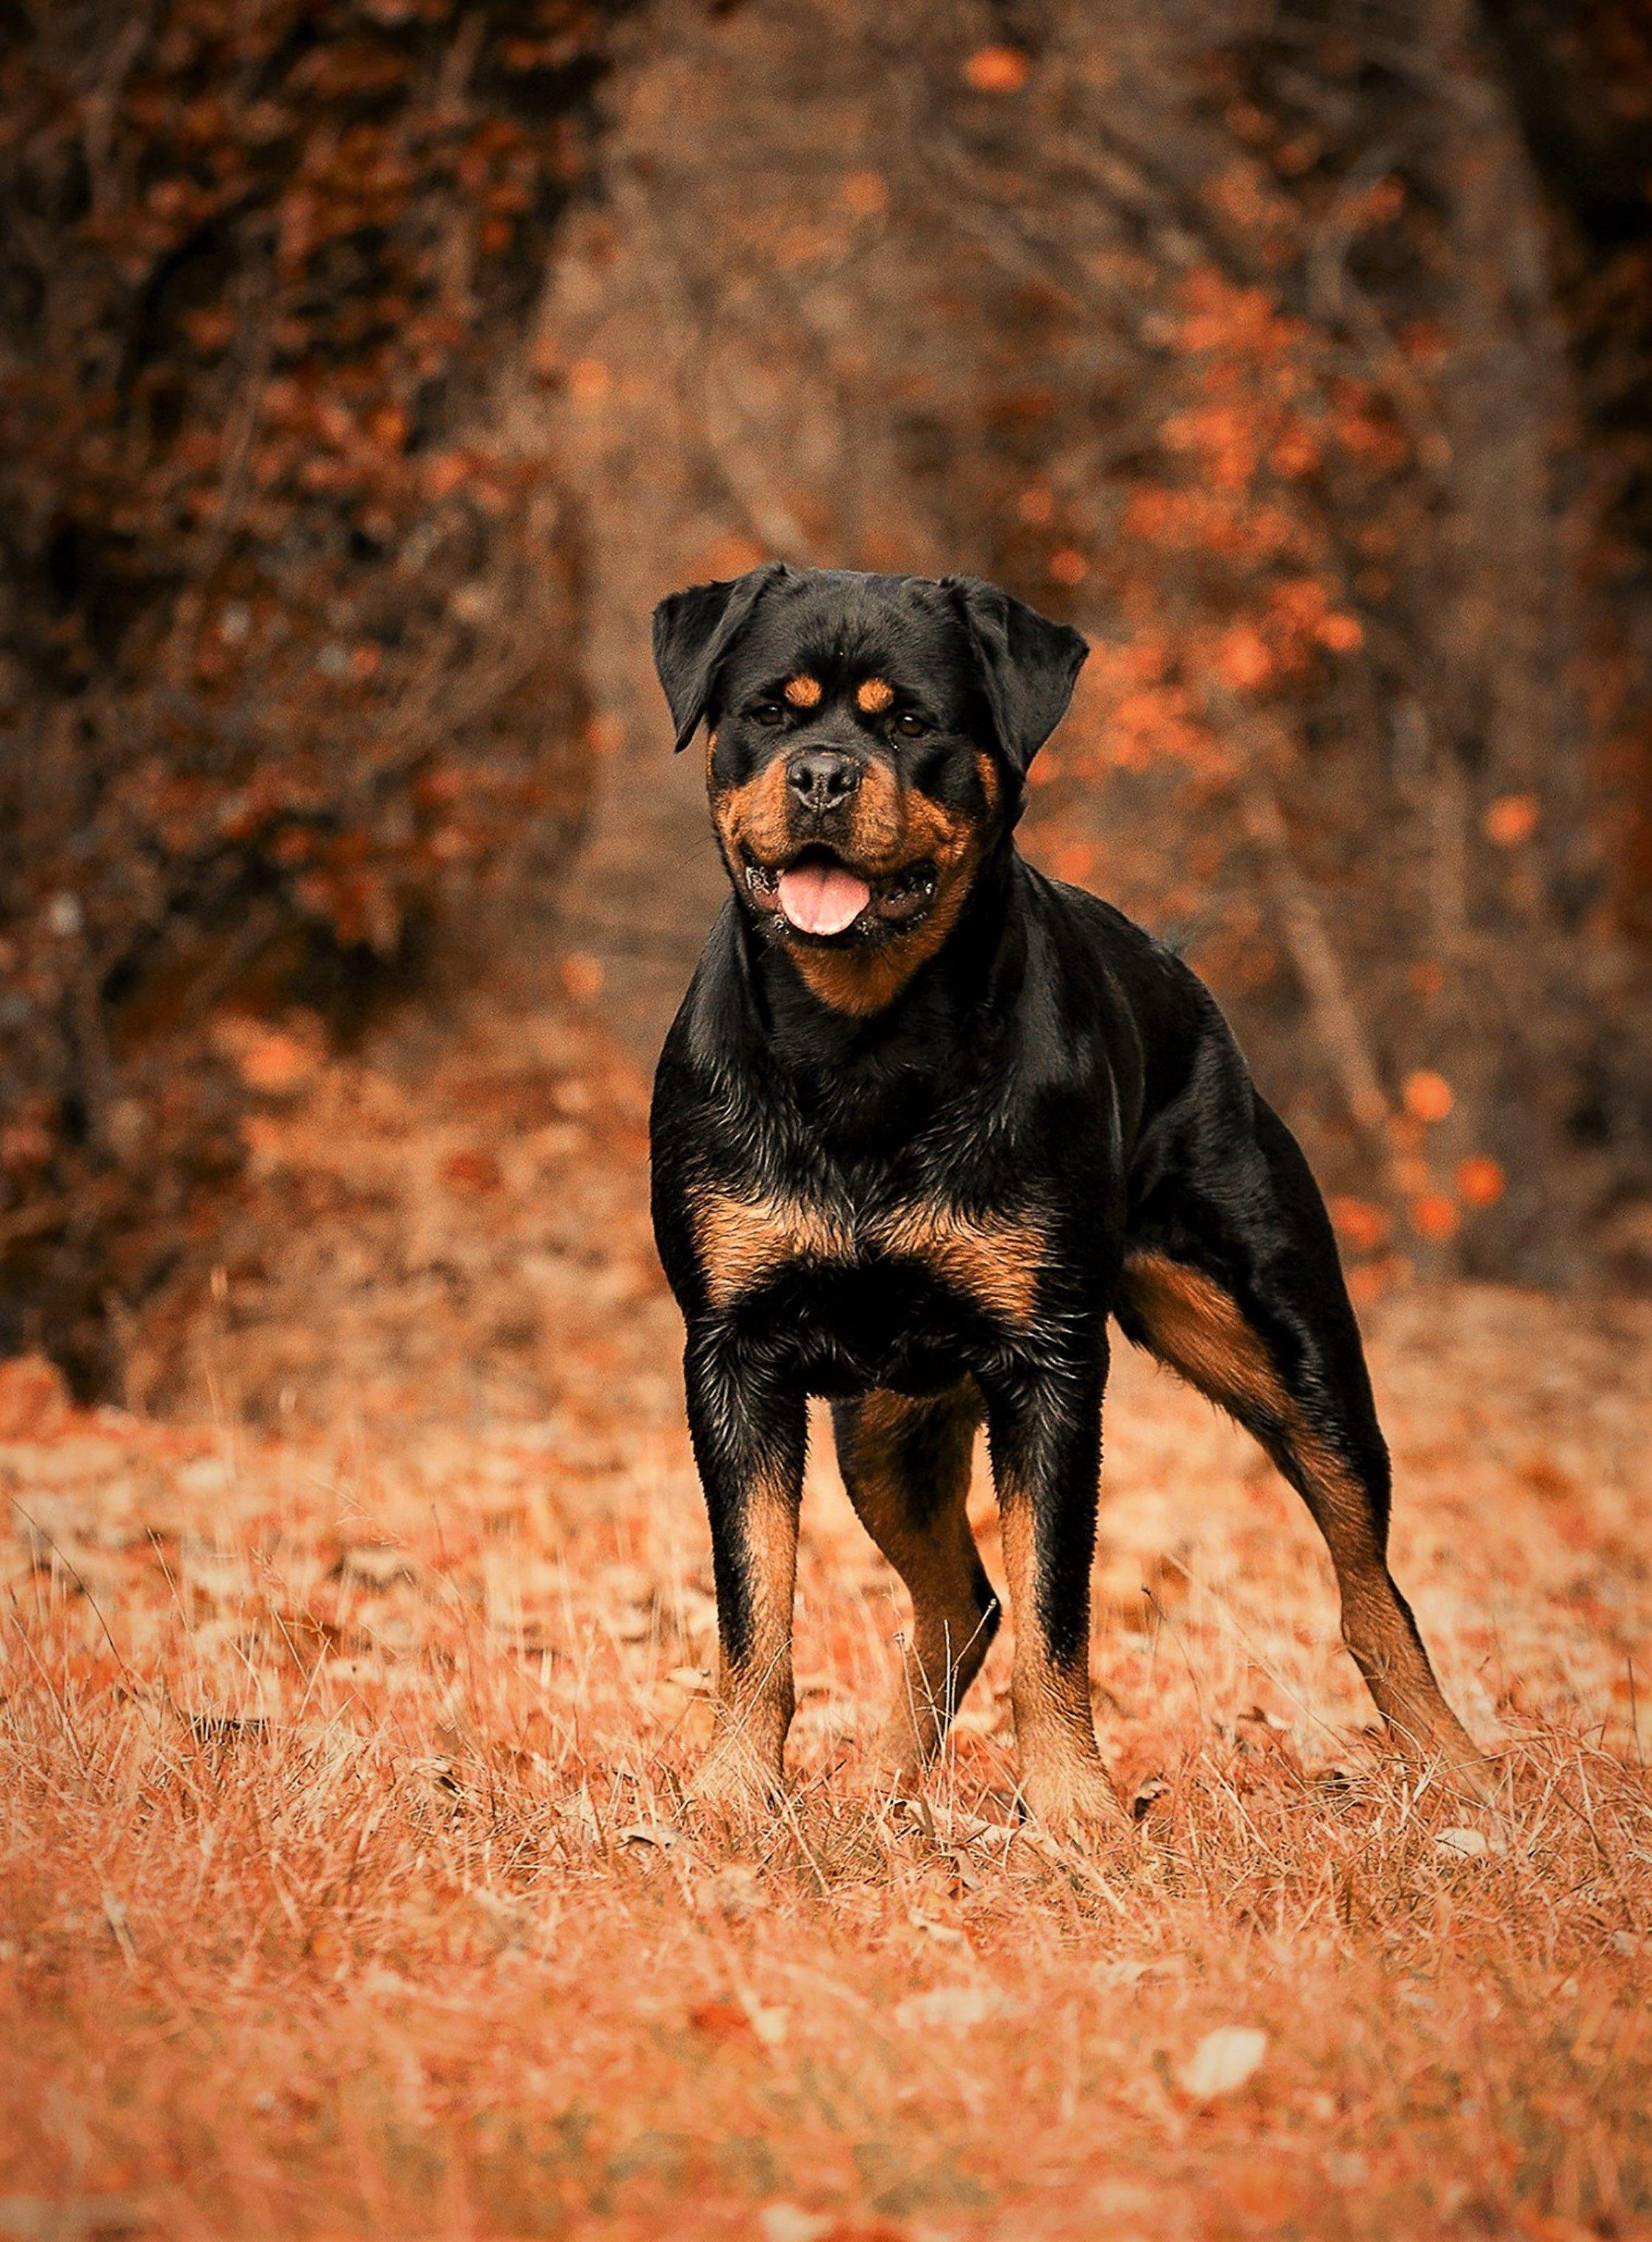 Pin By Alphonse Spurlock Jr On Rottie Rottweiler Dog Rottweiler Dog Stock Photo